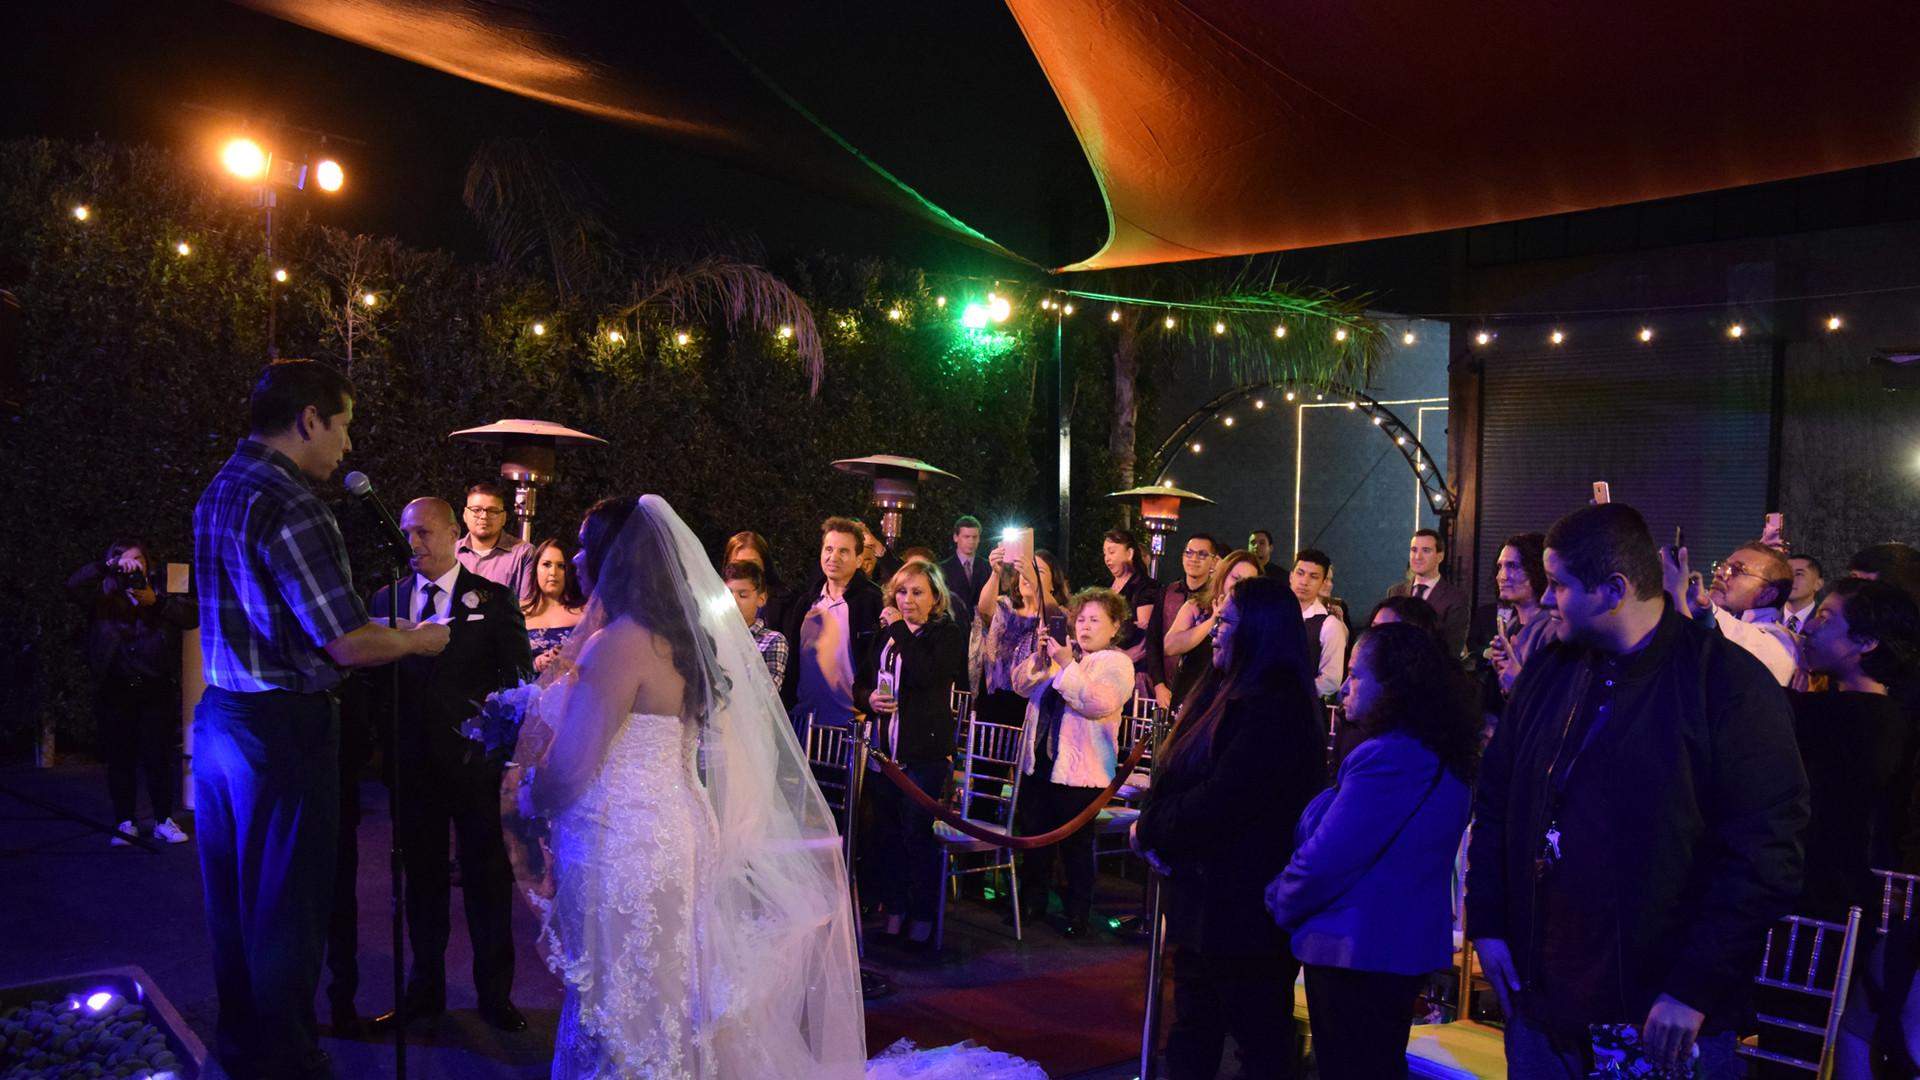 TCH12.21_Wedding_Ceremony_Night.jpg